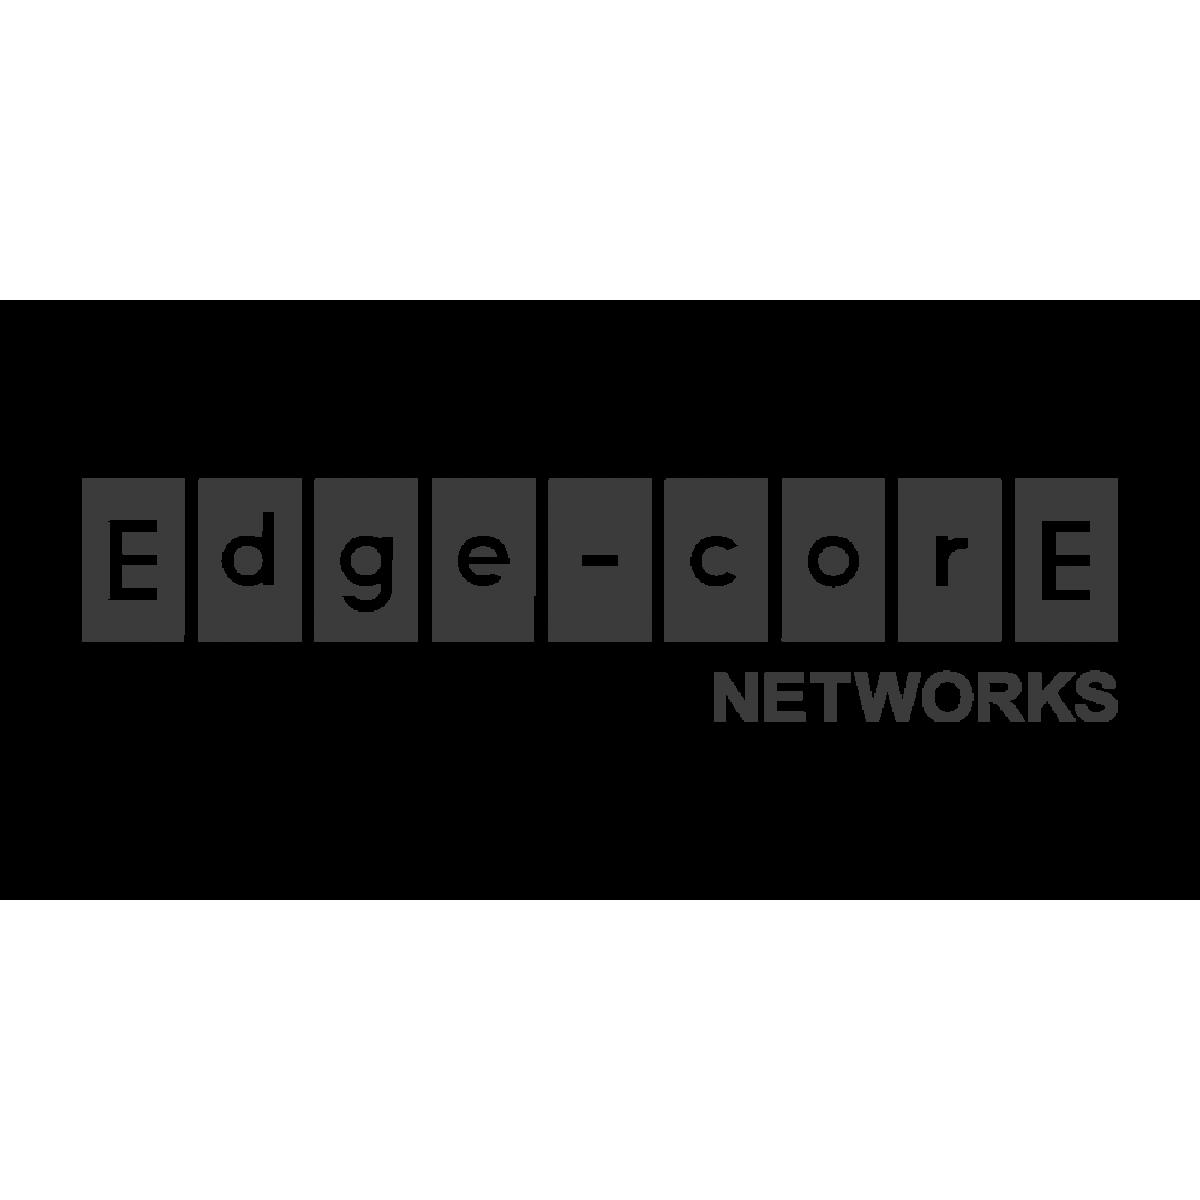 Edge-Core